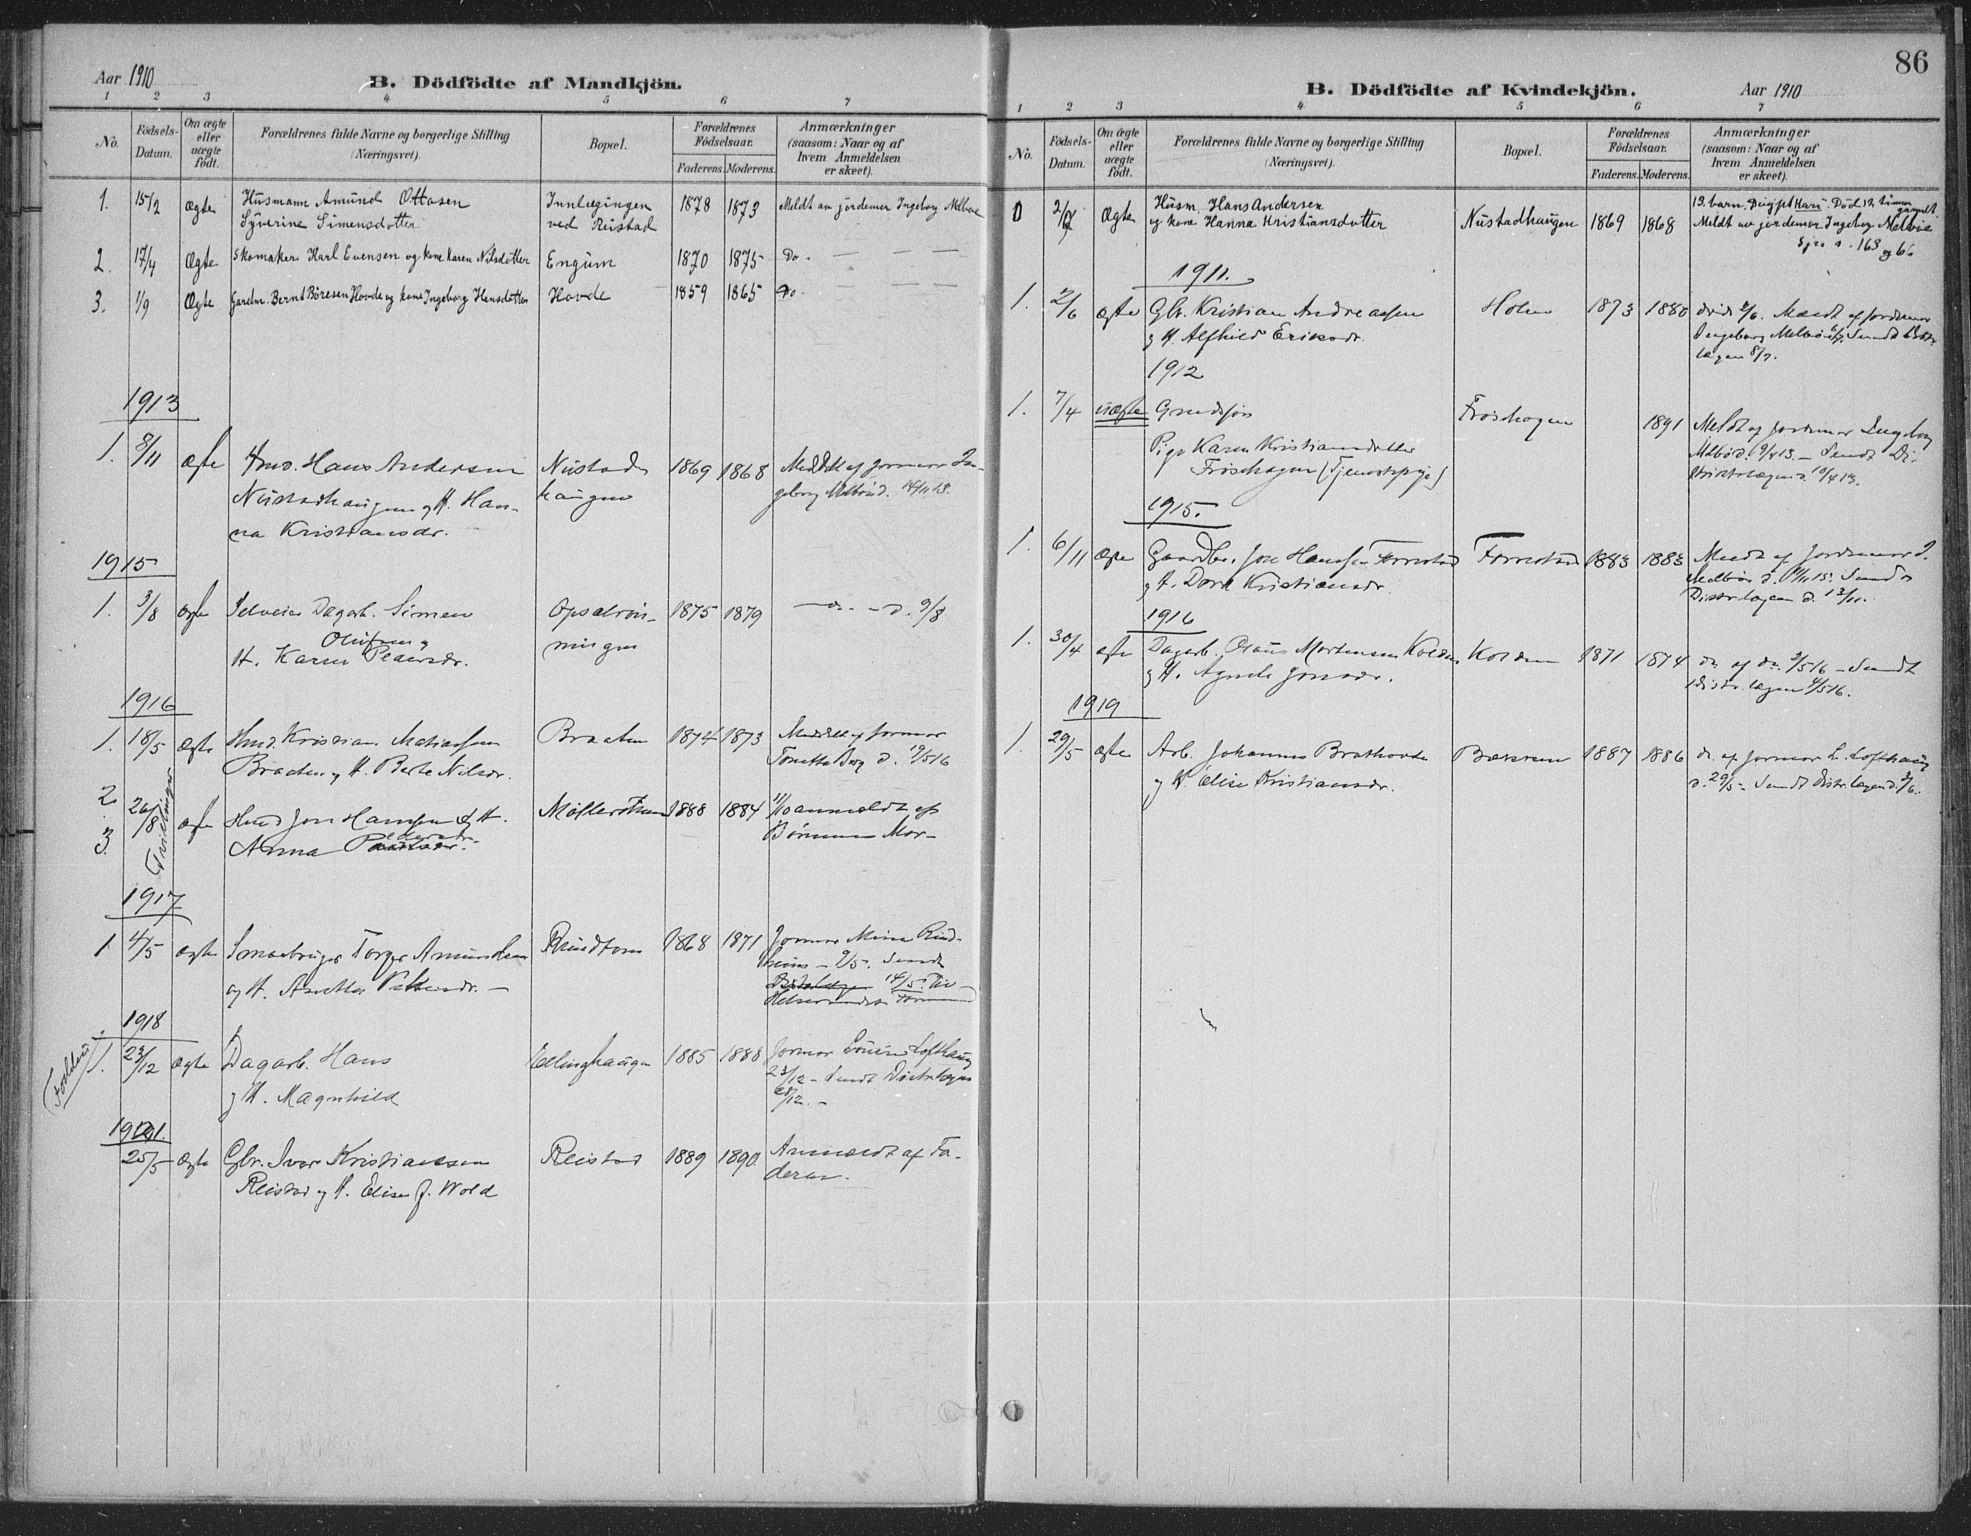 SAH, Østre Gausdal prestekontor, Ministerialbok nr. 4, 1898-1914, s. 86